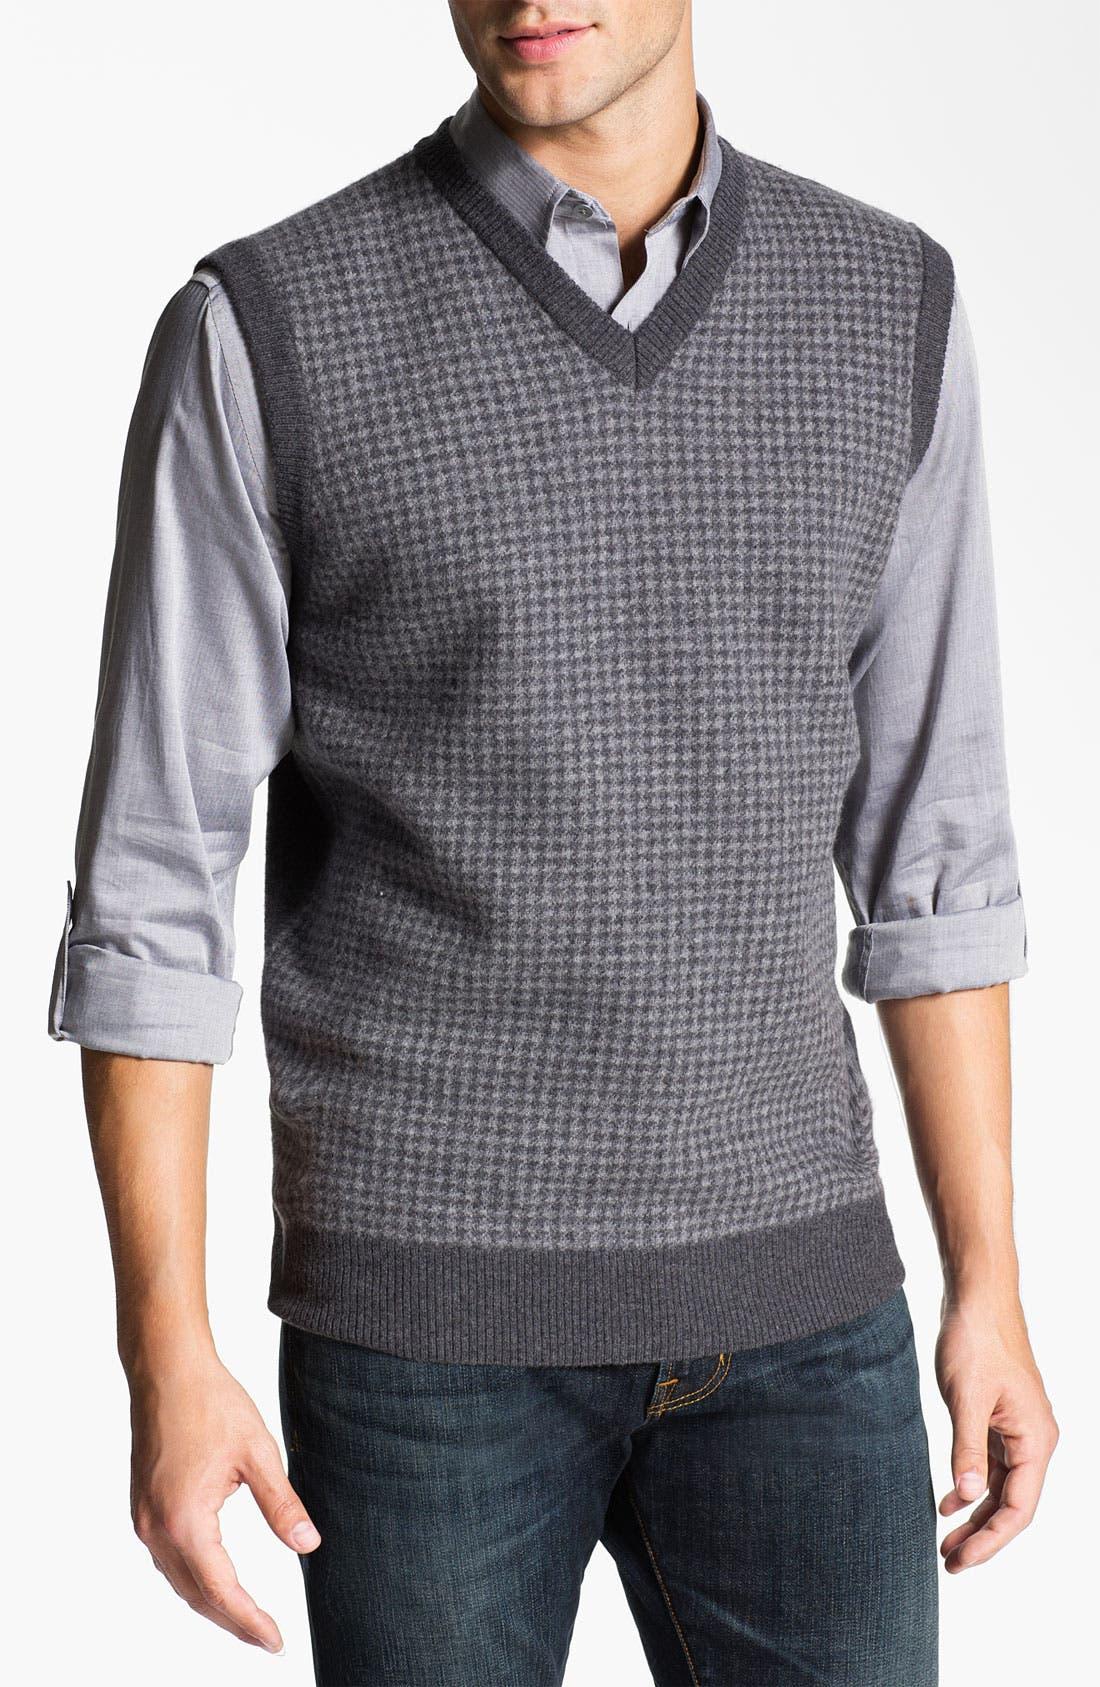 Alternate Image 1 Selected - Franco Danti V-Neck Wool Sweater Vest